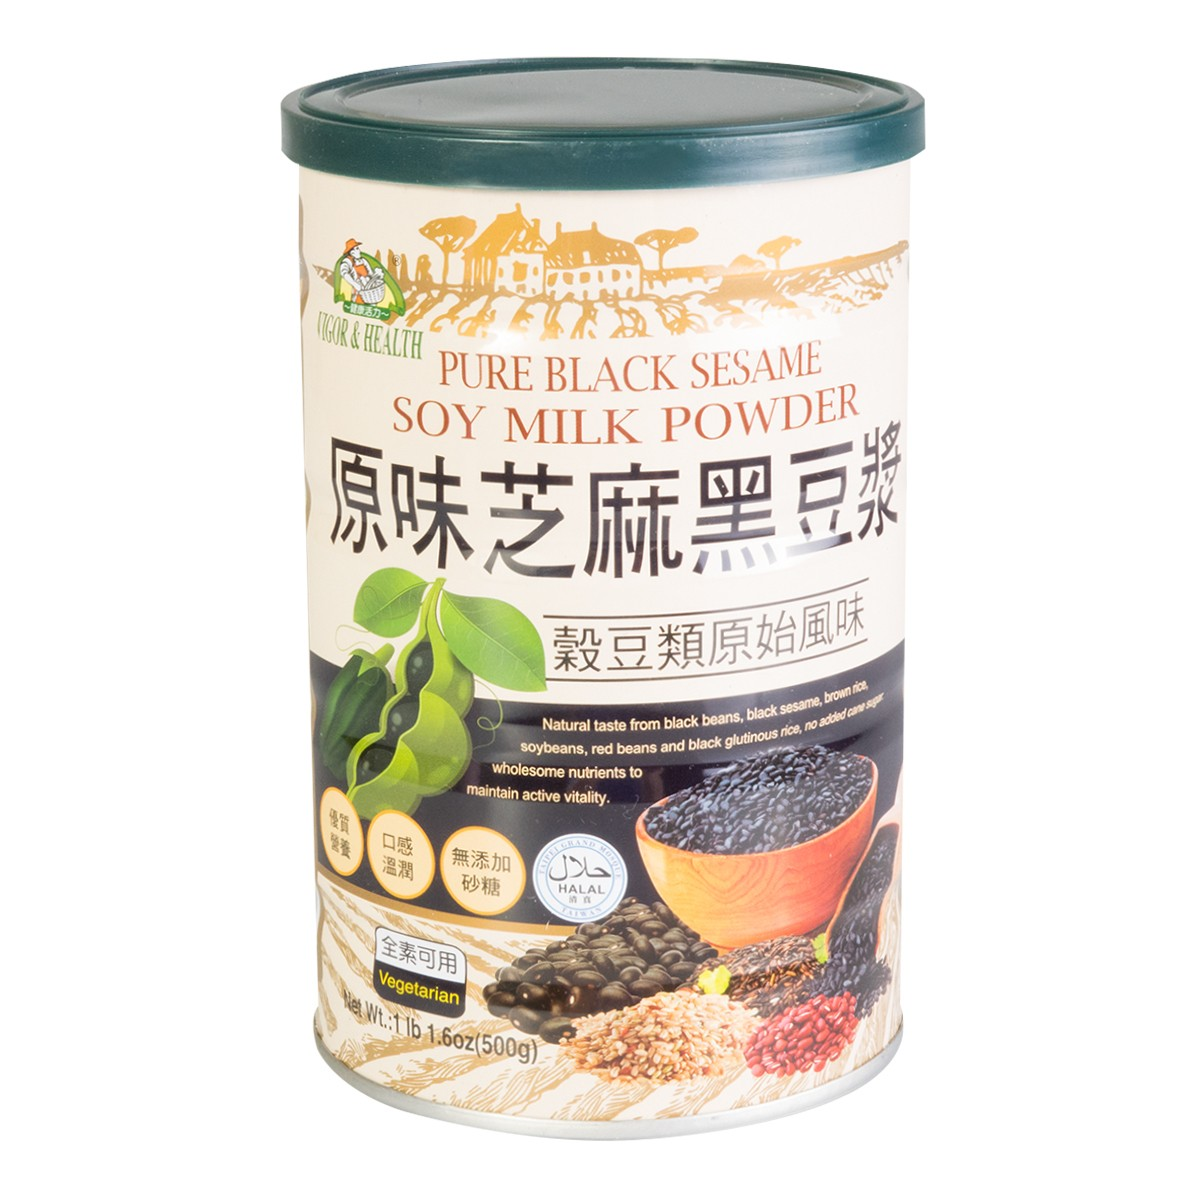 ORGANIC CHATEAU Pure Black Sesame Soy Milk Powder 500g